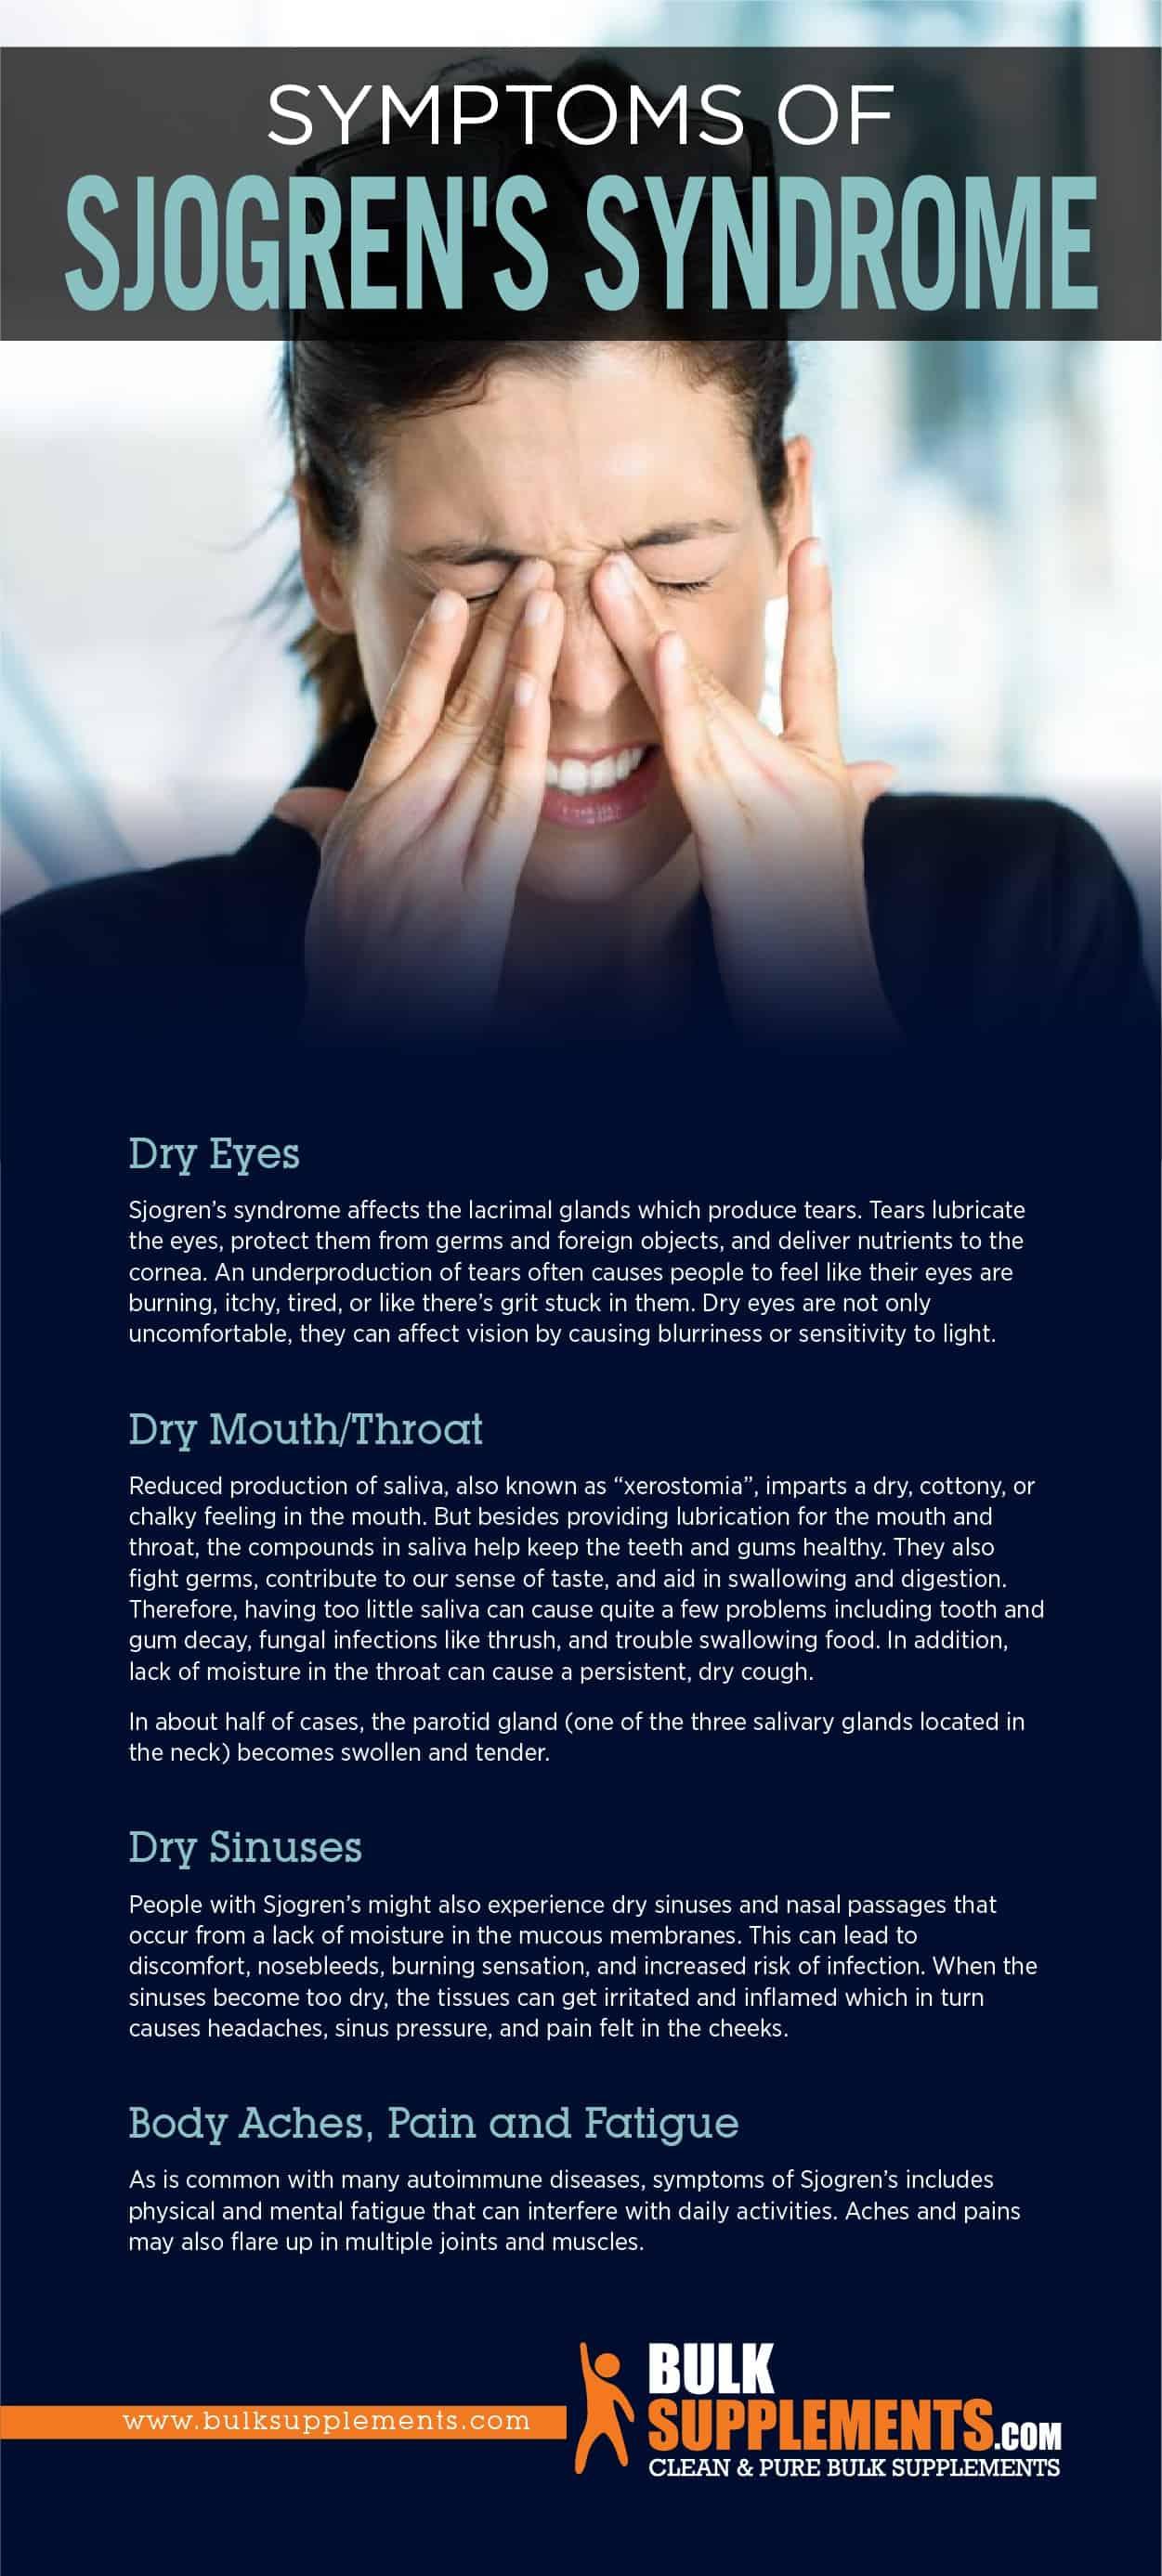 Symptoms of Sjogren's Syndrome